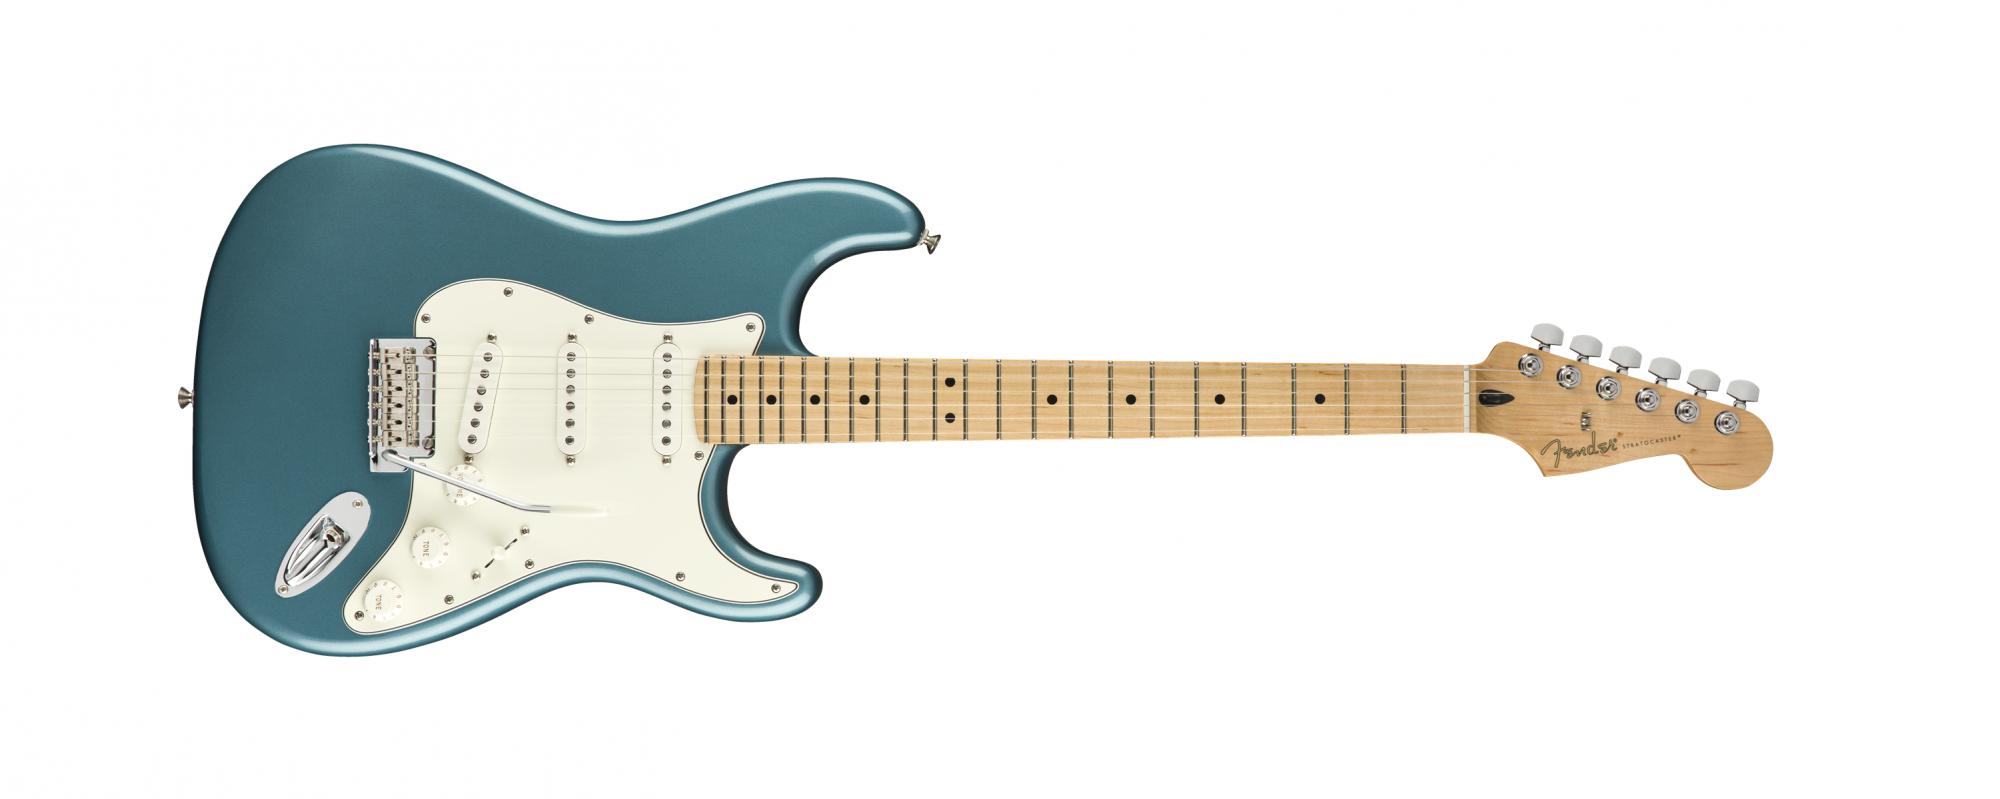 Fender Player Stratocaster Maple Neck, Tidepool